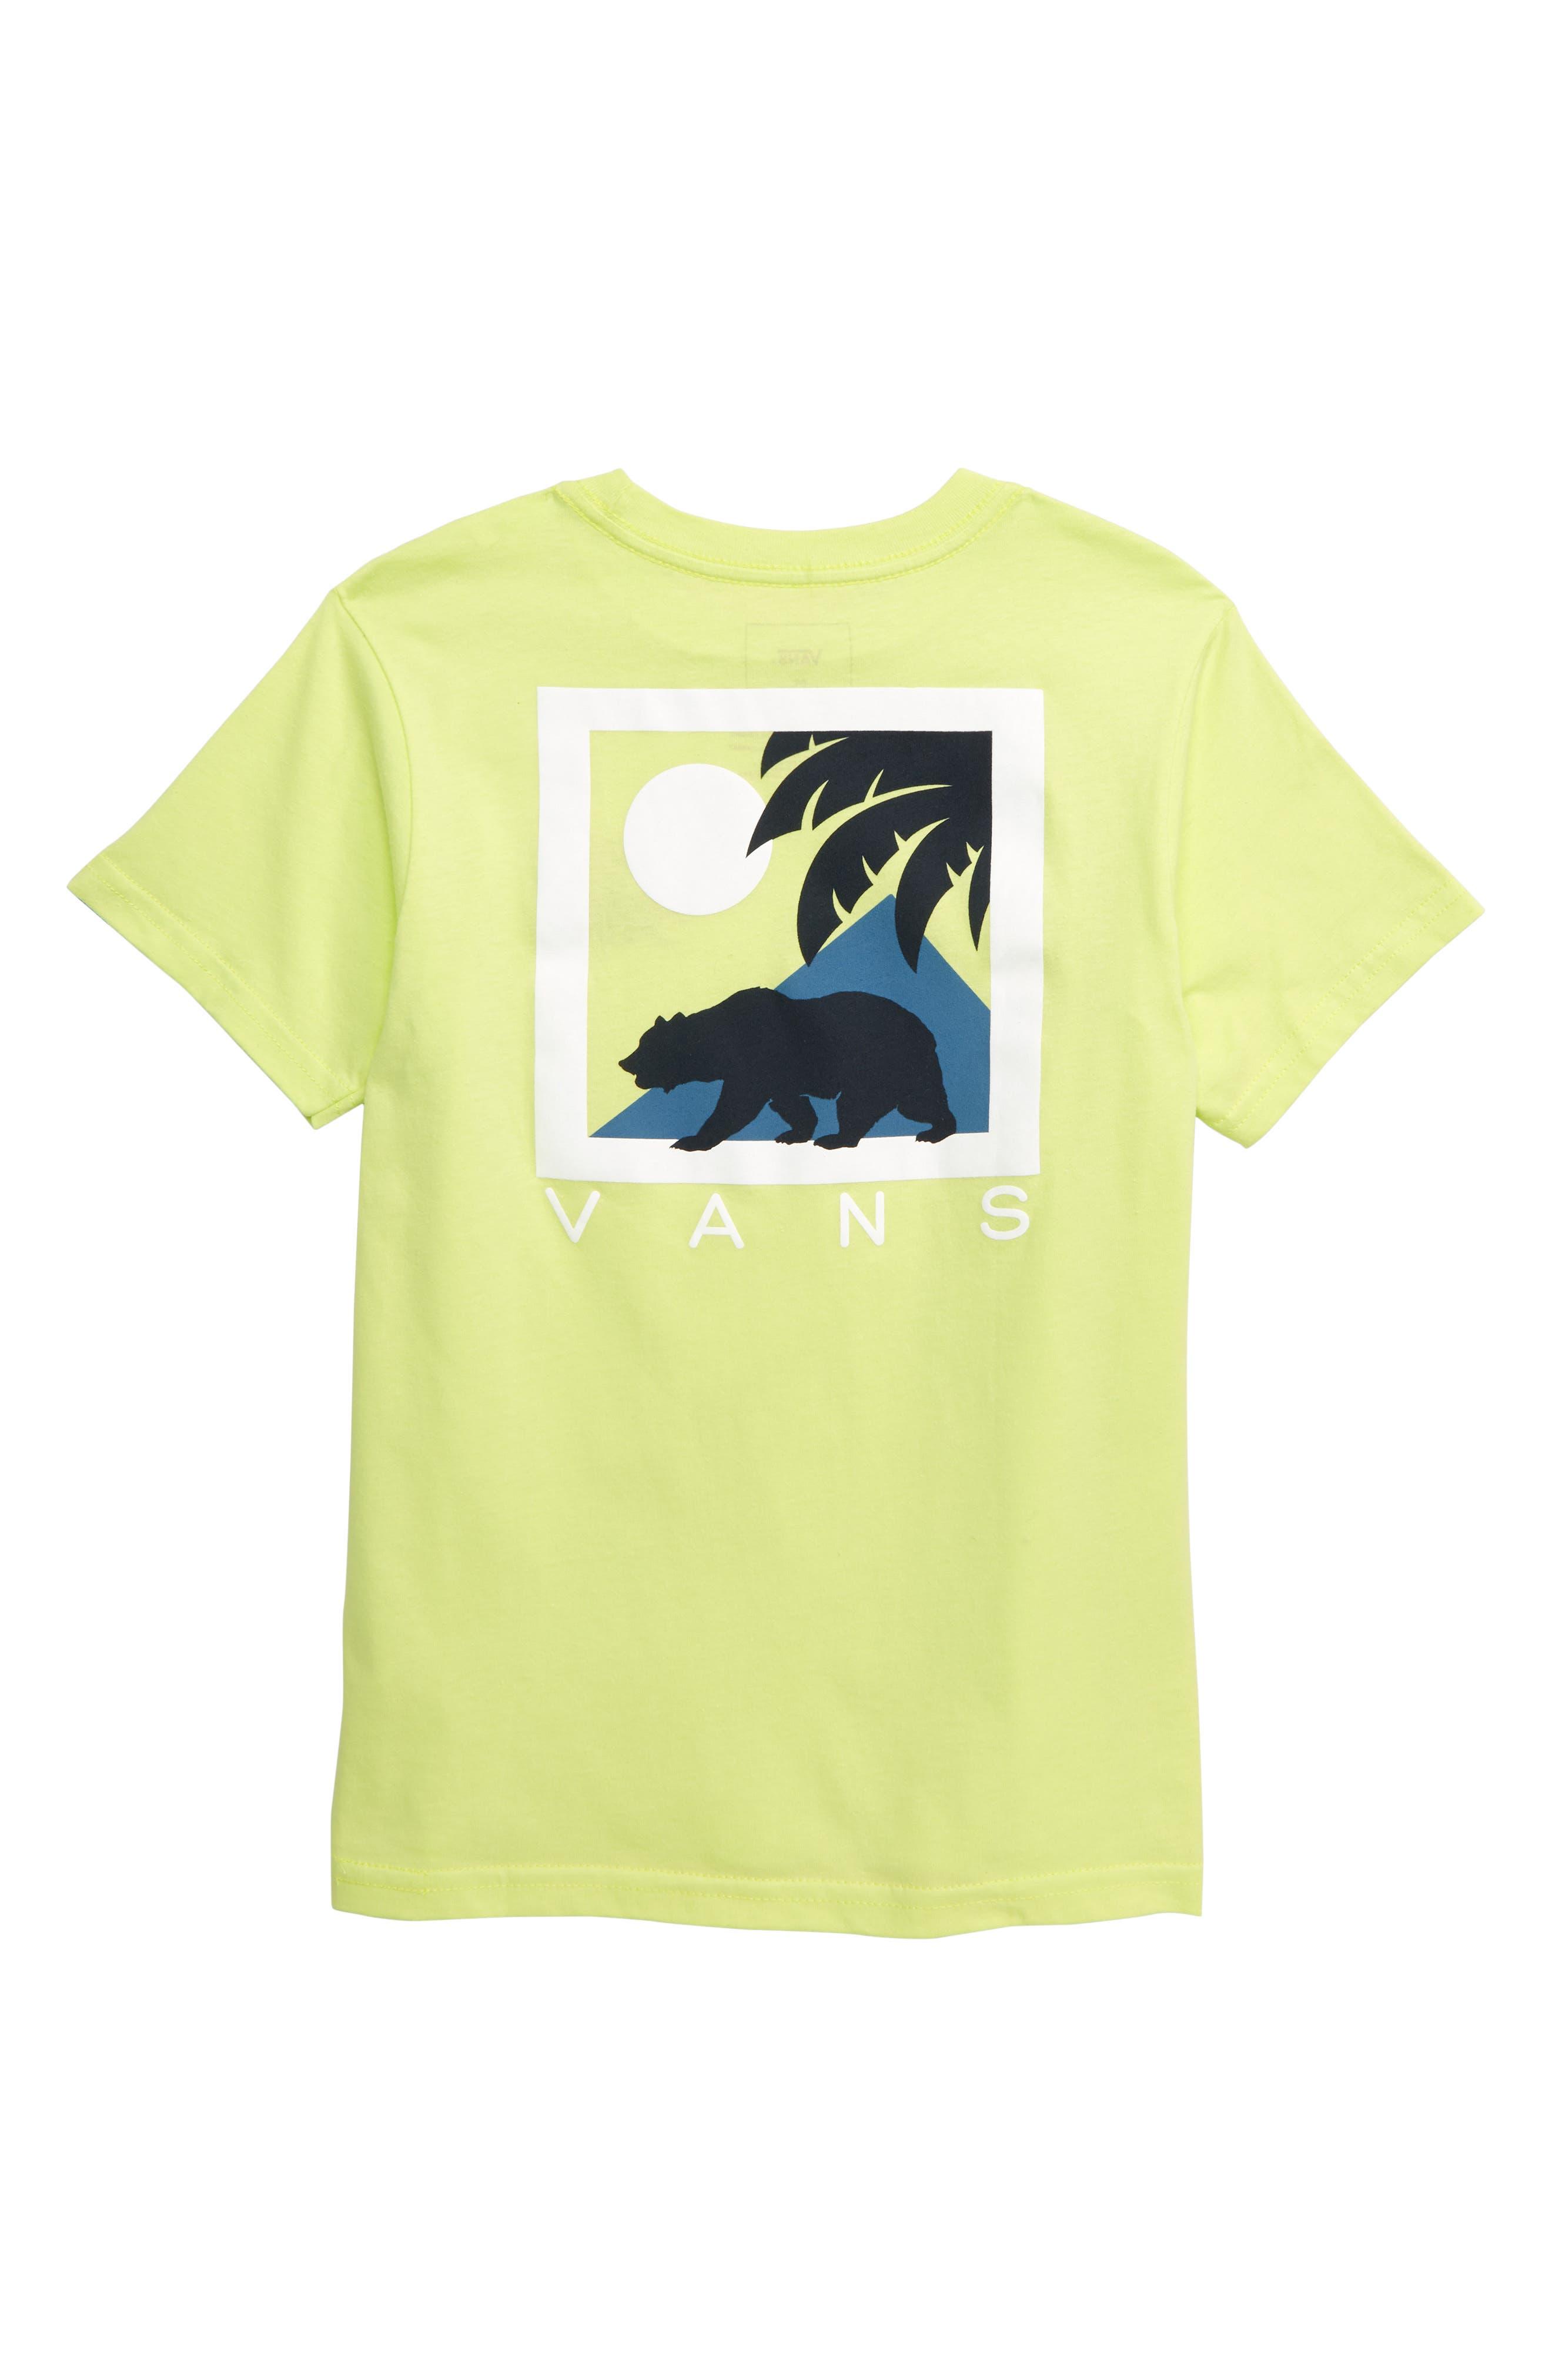 VANS, Cali Winter Graphic T-Shirt, Alternate thumbnail 2, color, SUNNY LIME